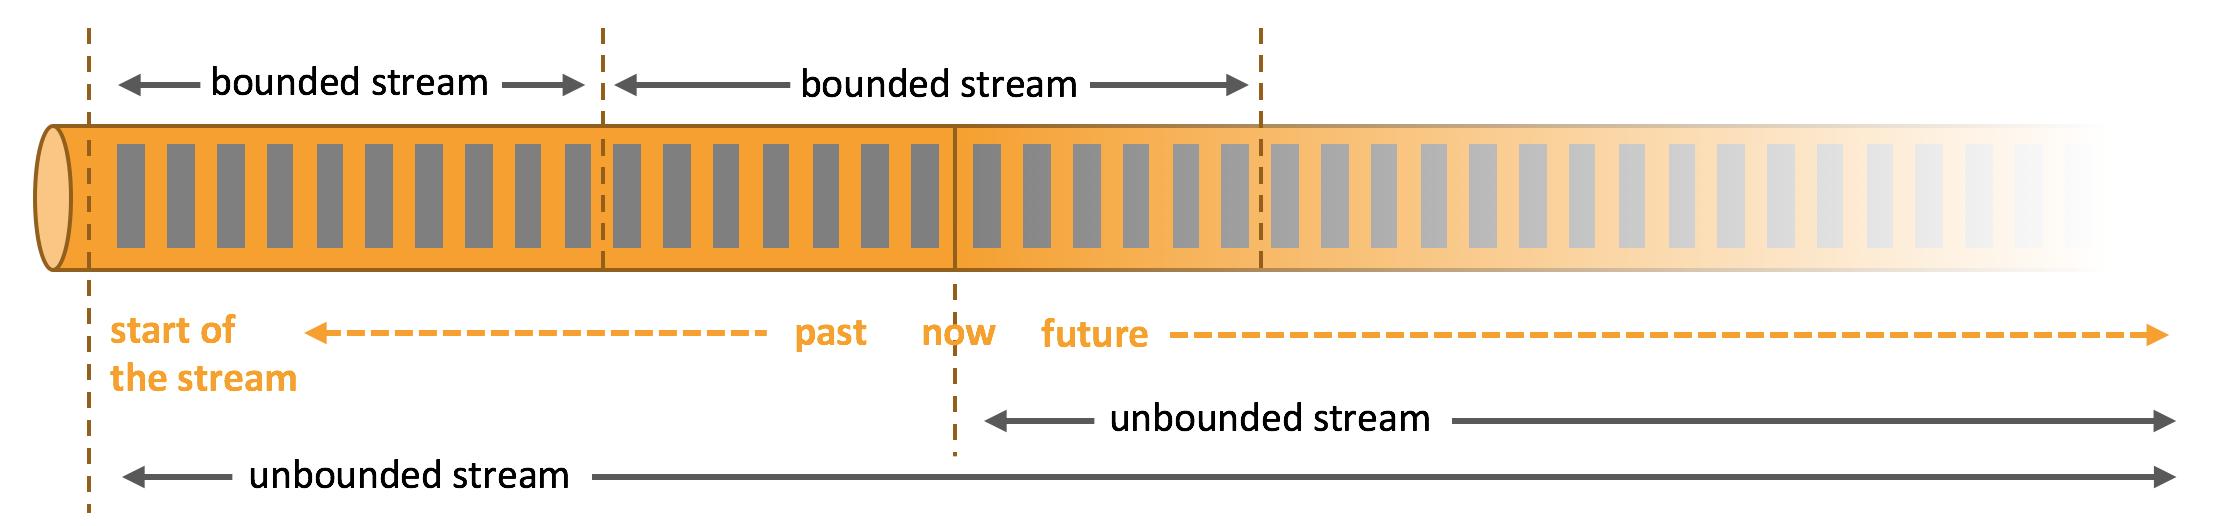 Flink 官网的解释图